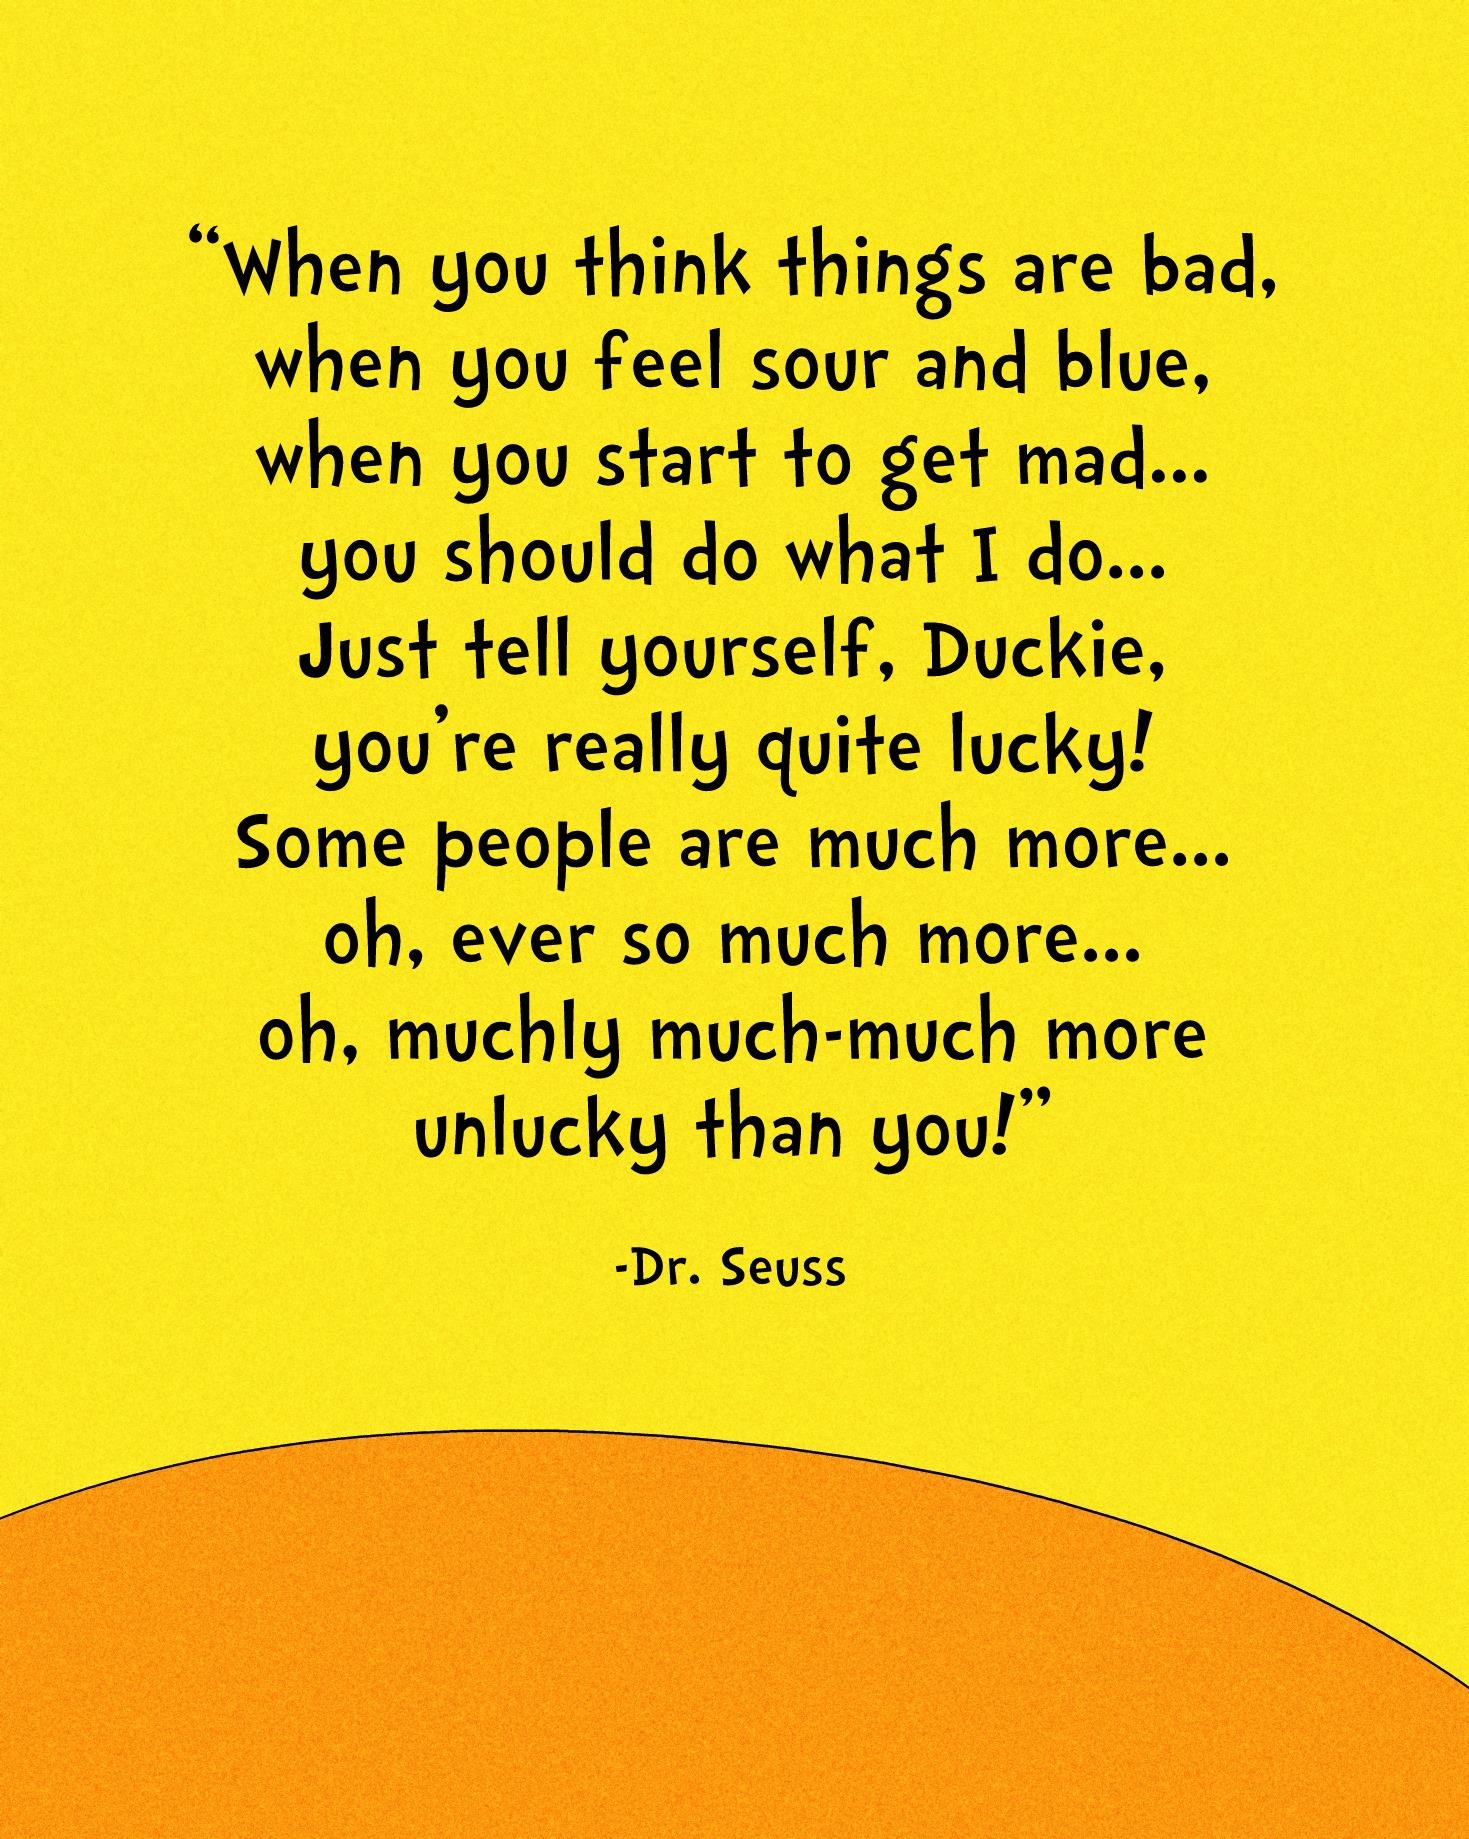 Three Free Dr. Seuss Printables // lemon squeezy home